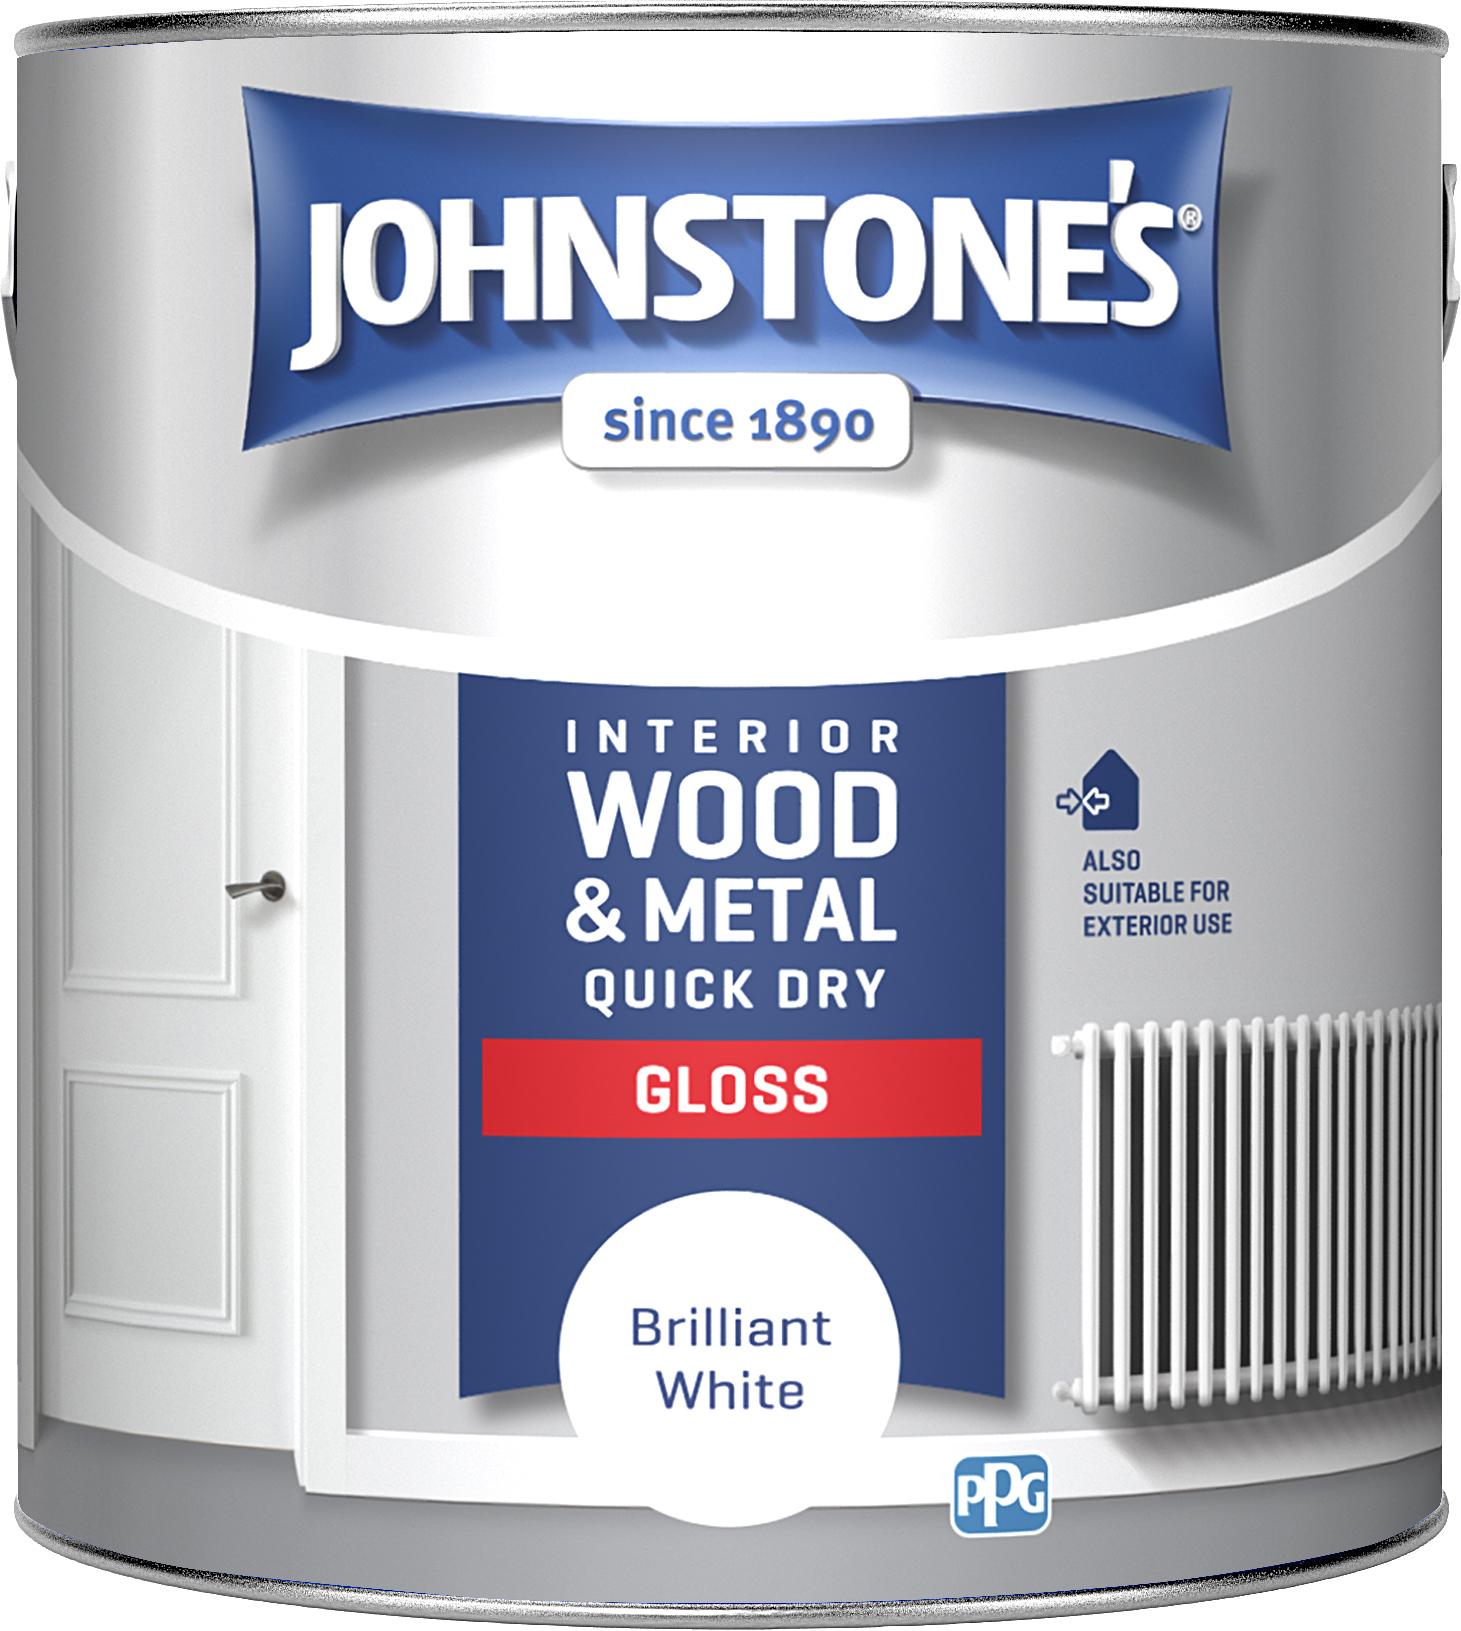 Johnstones 2.5 Litre Quick Dry Gloss Paint - Brilliant White